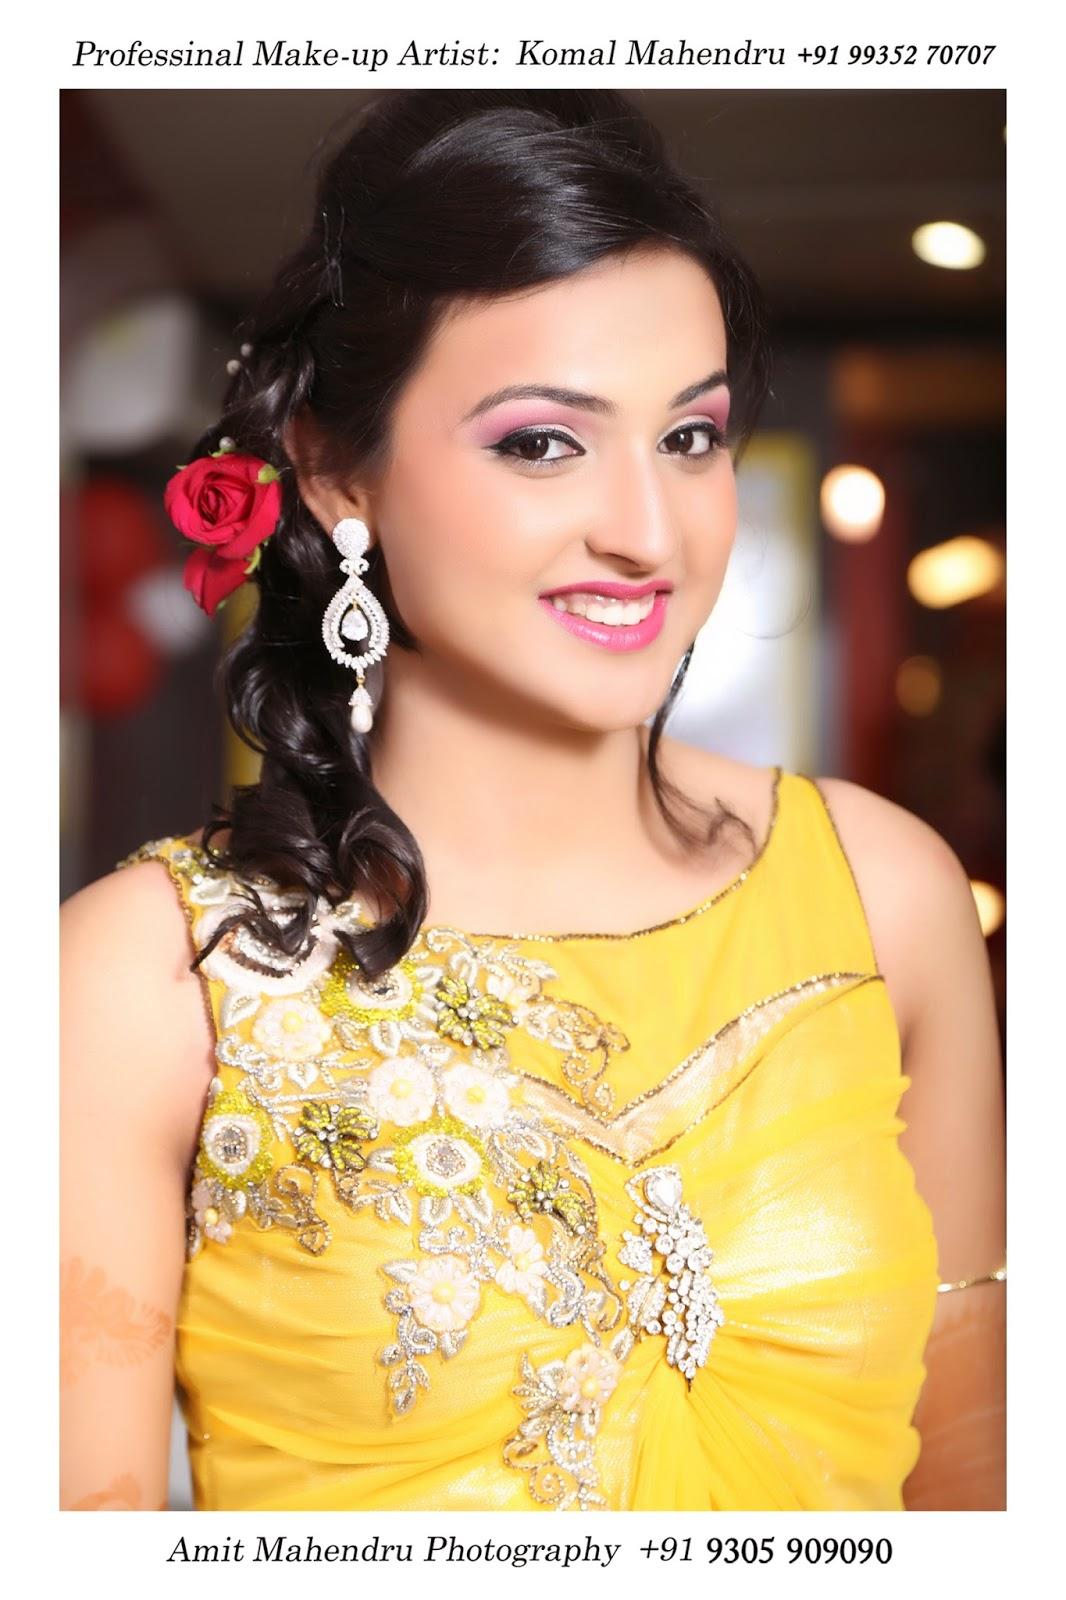 Komal Mahendru's Professional Makeup